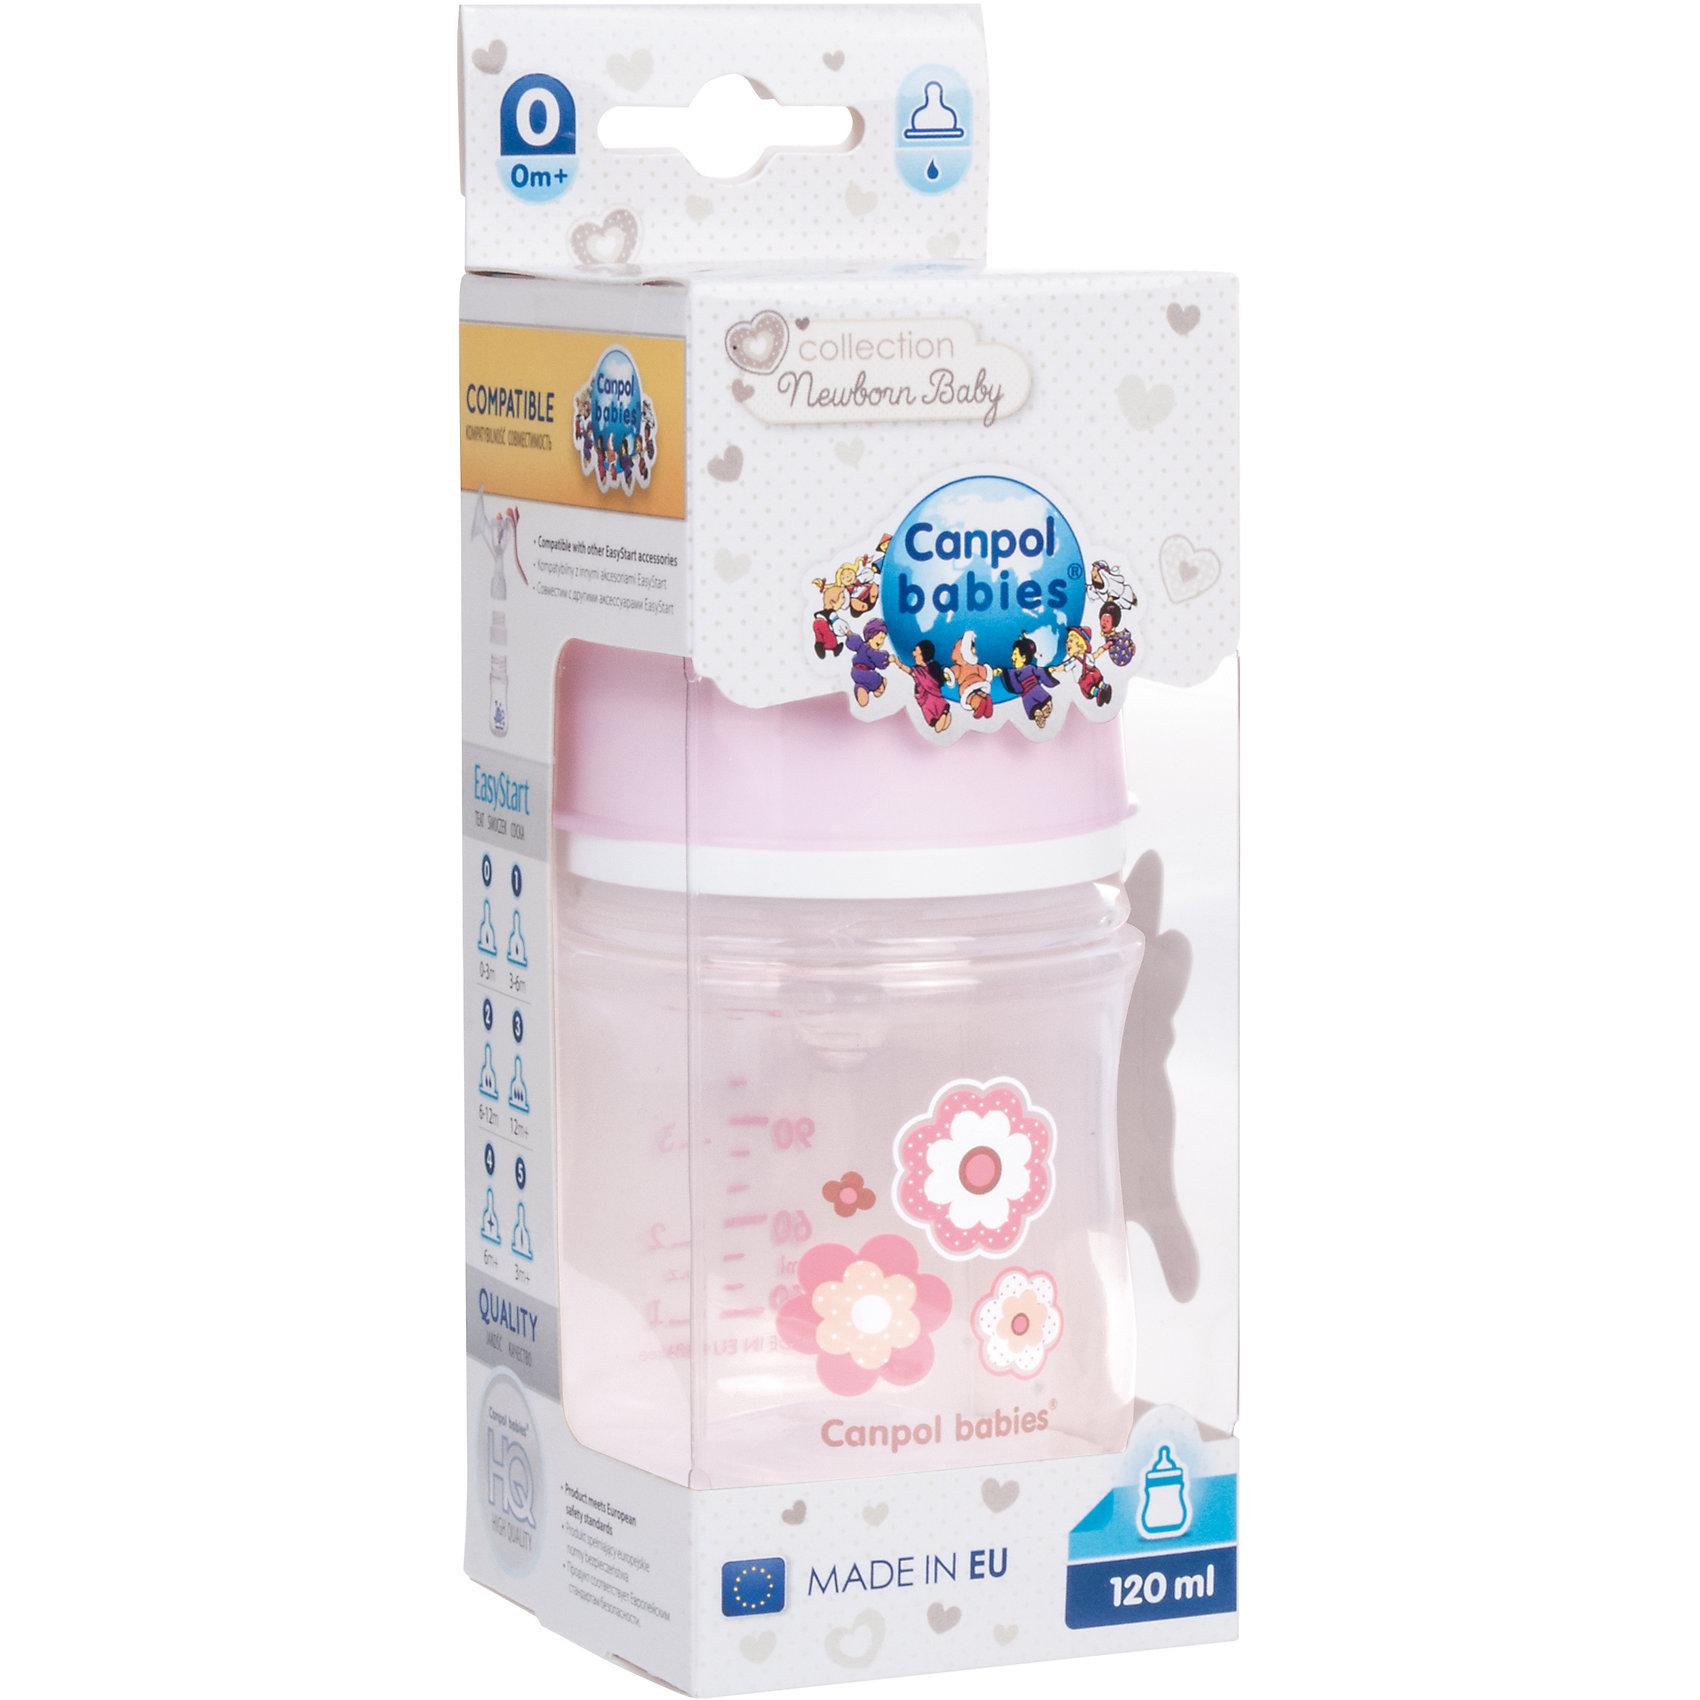 Canpol Babies Бутылочка PP EasyStart с широким горлышком антиколиковая, 120 мл, 0+ Newborn baby, Canpol Babies, розовый